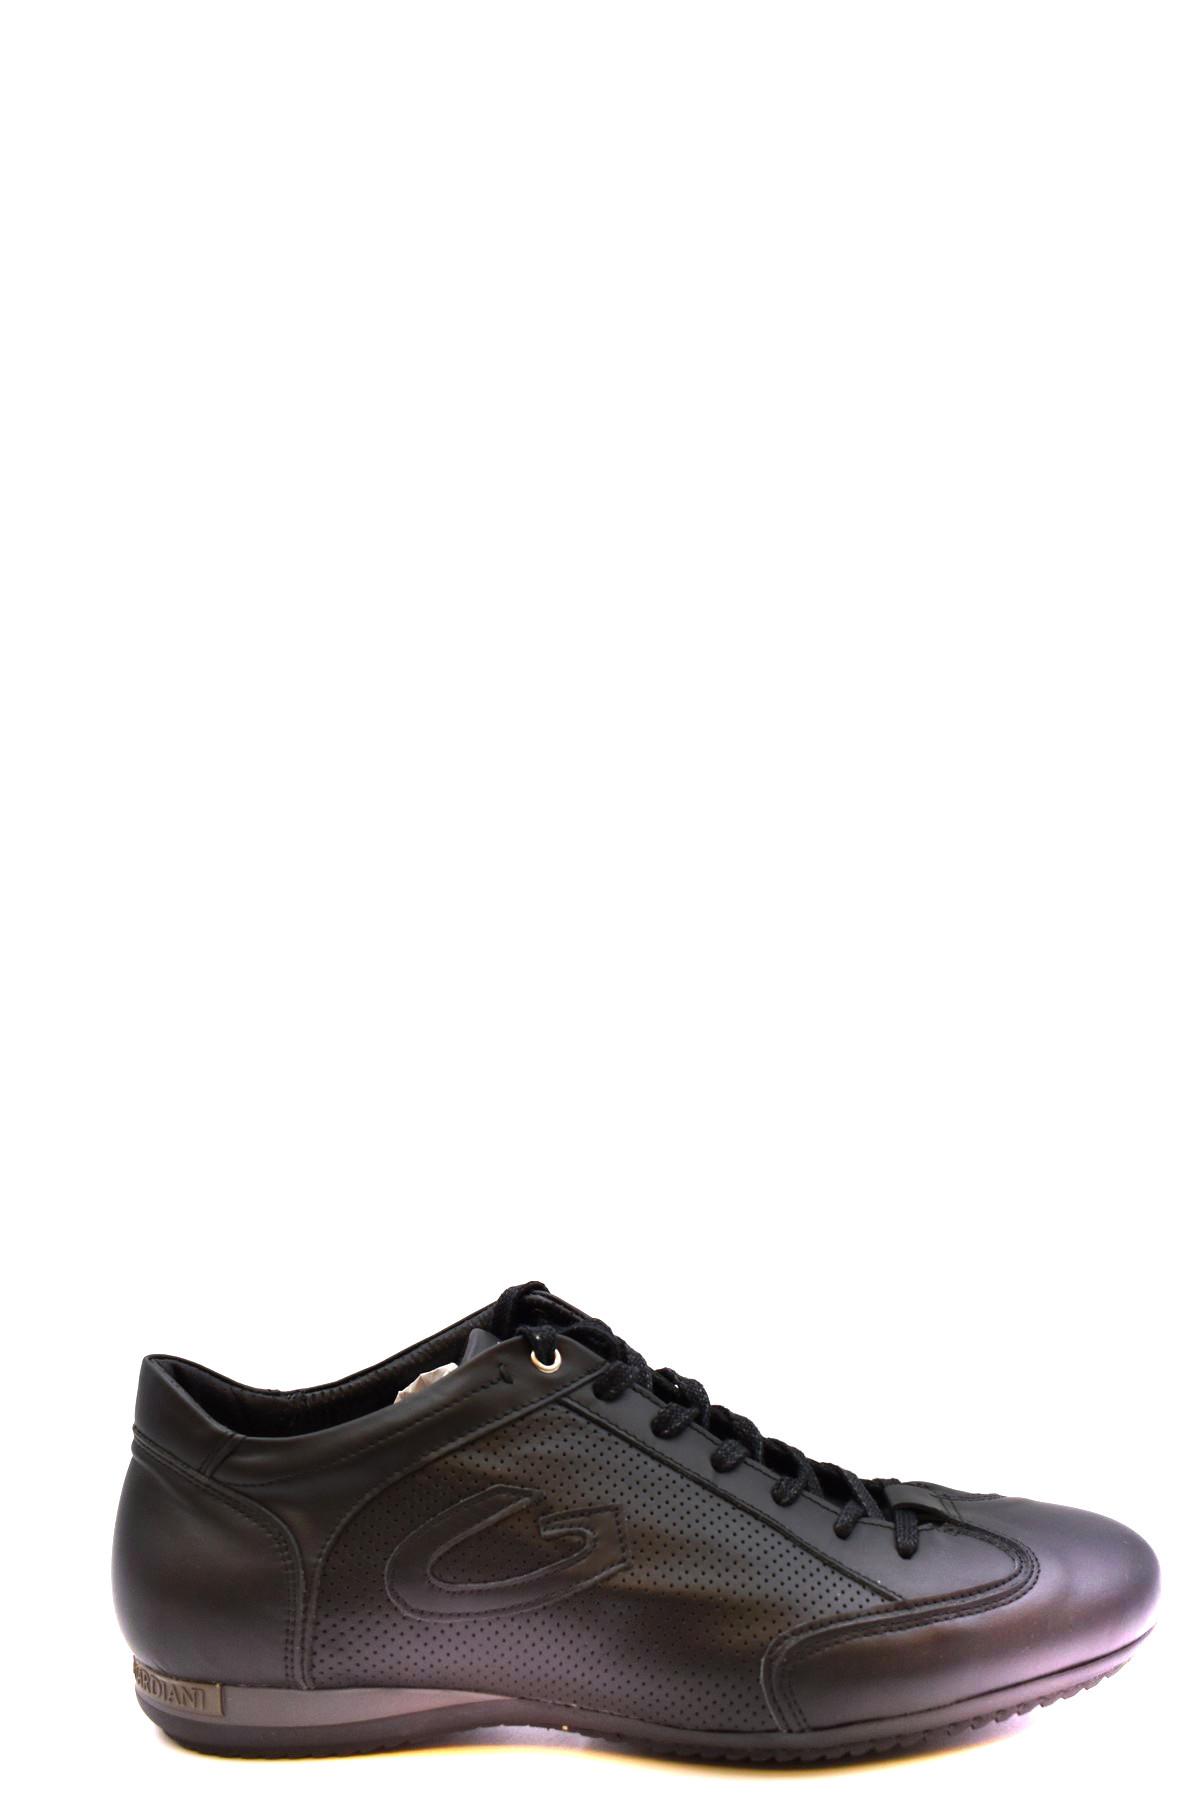 Guardiani Sneakers Muži